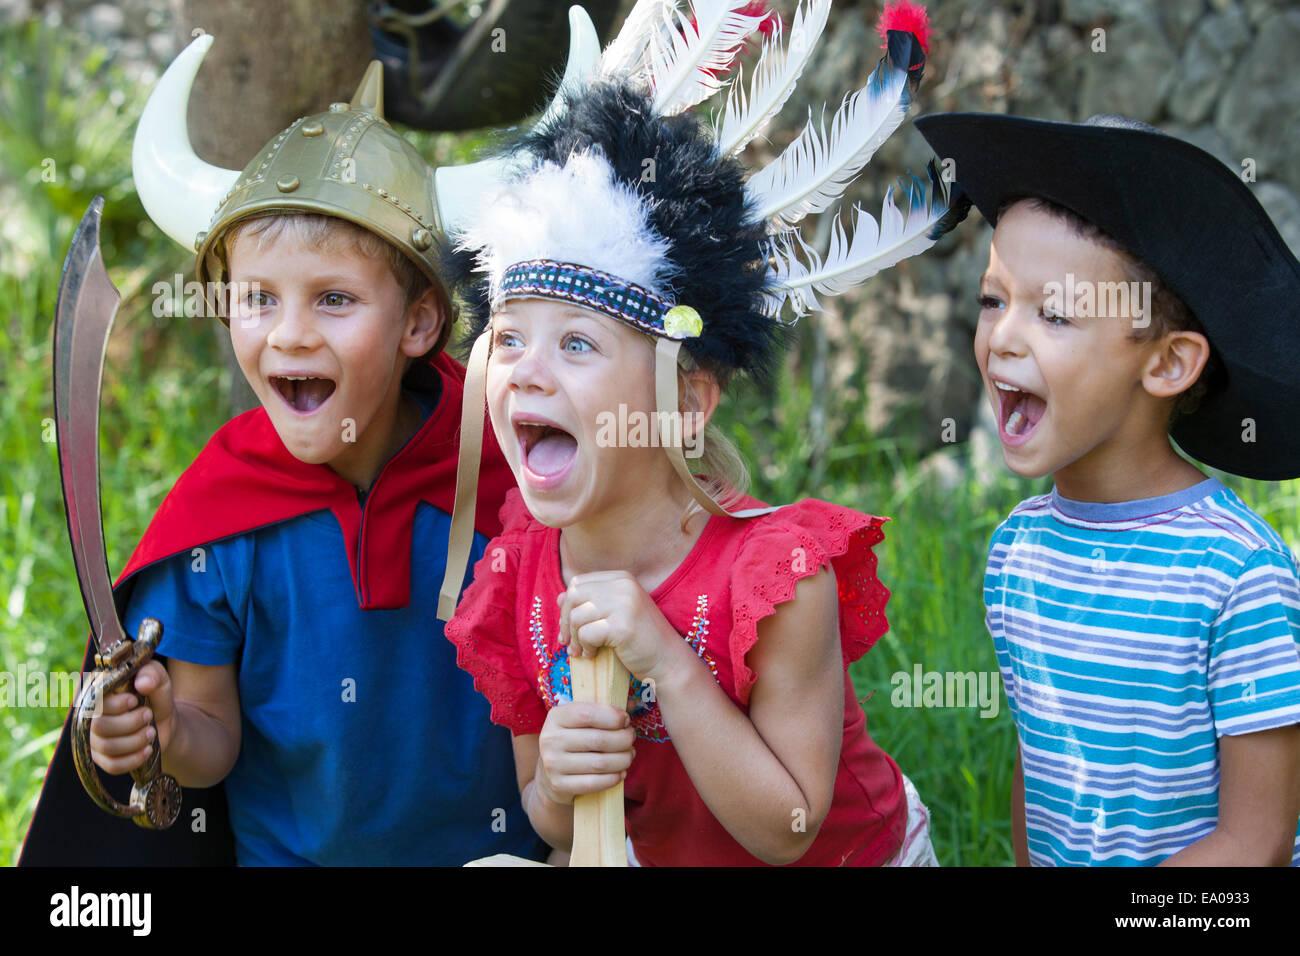 Drei Kinder tragen Fancy Dress Kostüme, spielen im park Stockbild